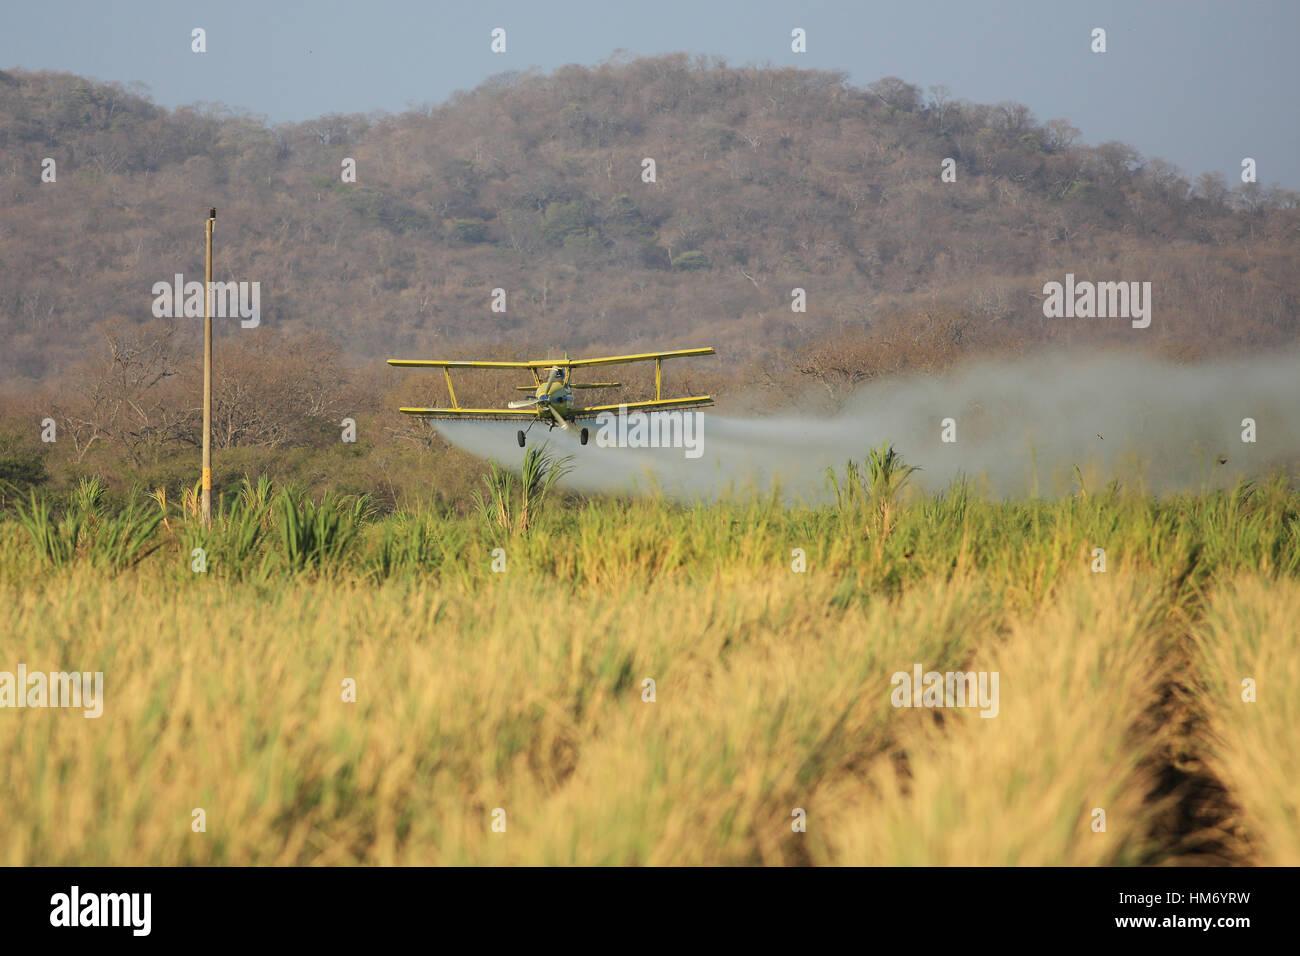 Aeroplane spraying pesticide over a rice plantation near Palo Verde National Park, Guanacaste, Costa Rica. - Stock Image